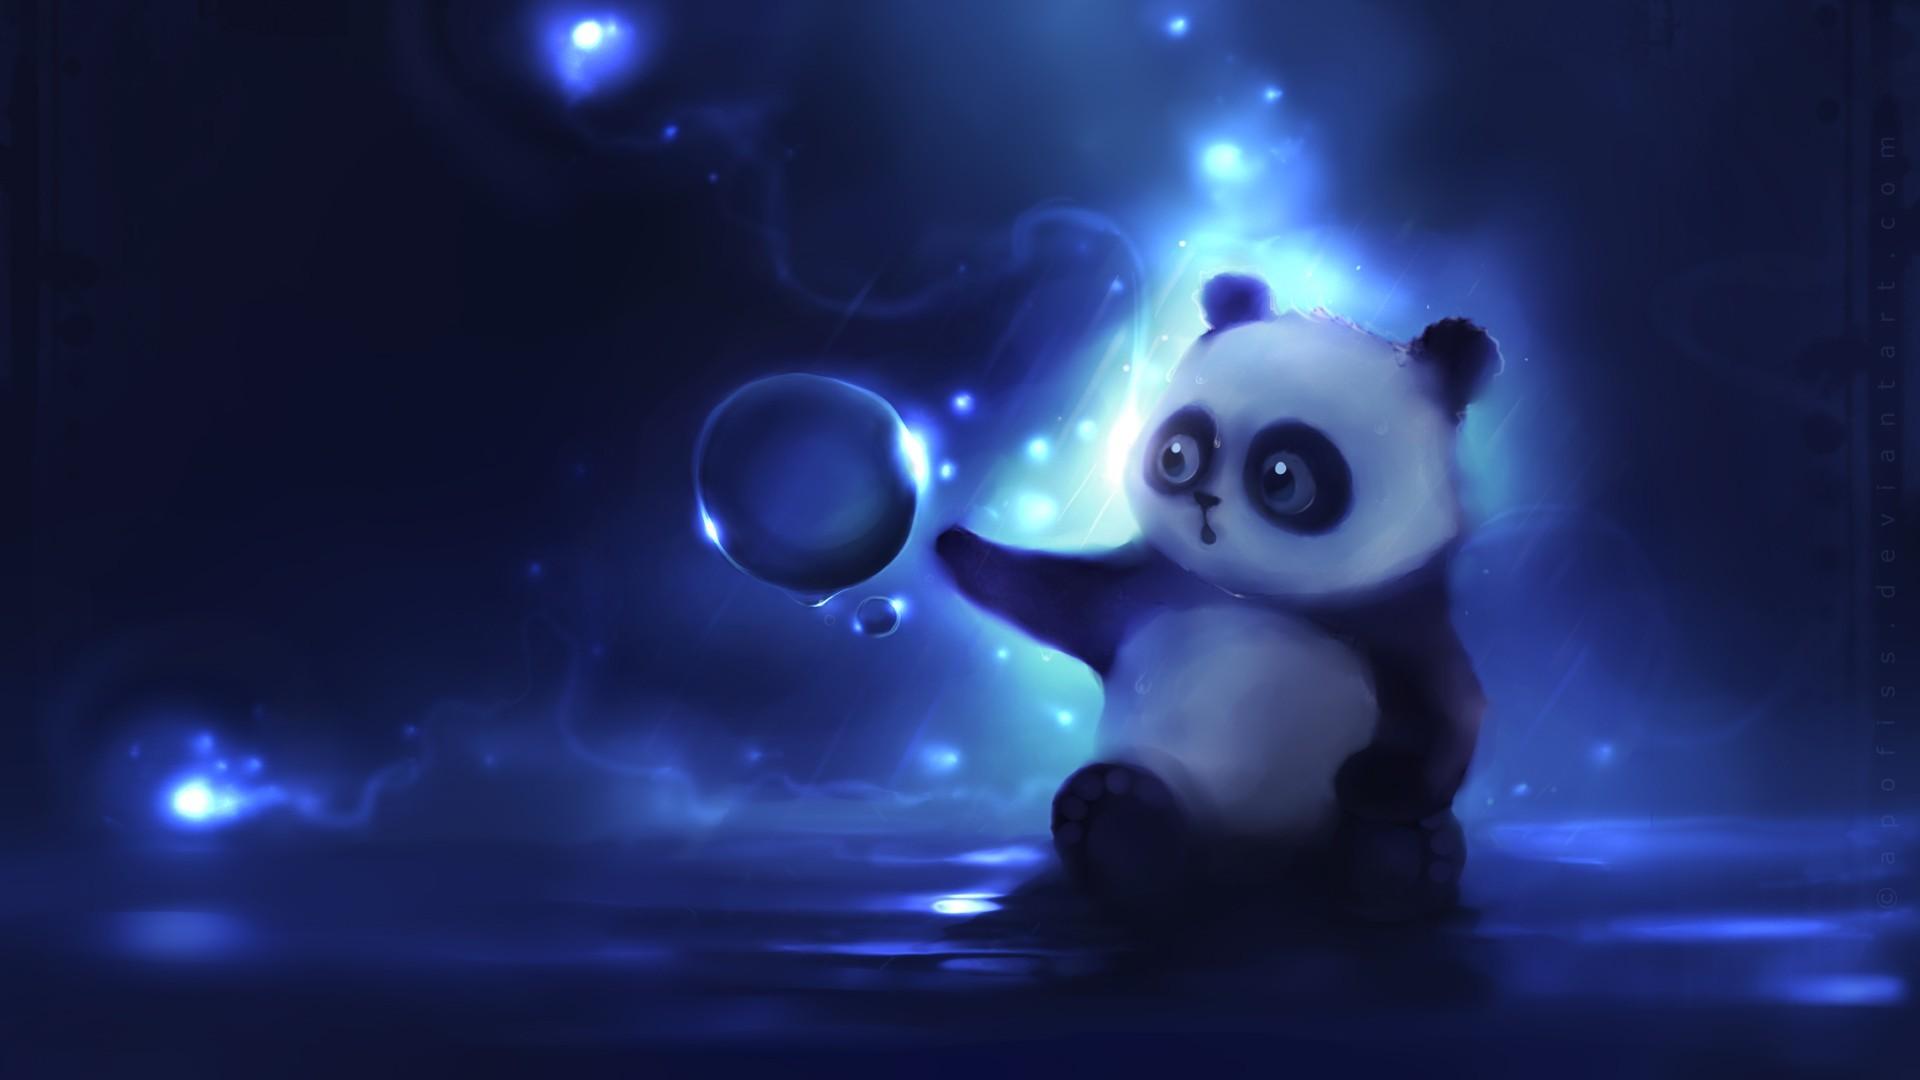 Panda Cartoon Cute Wallpapers #1862 Wallpaper | Cool Walldiskpaper.com